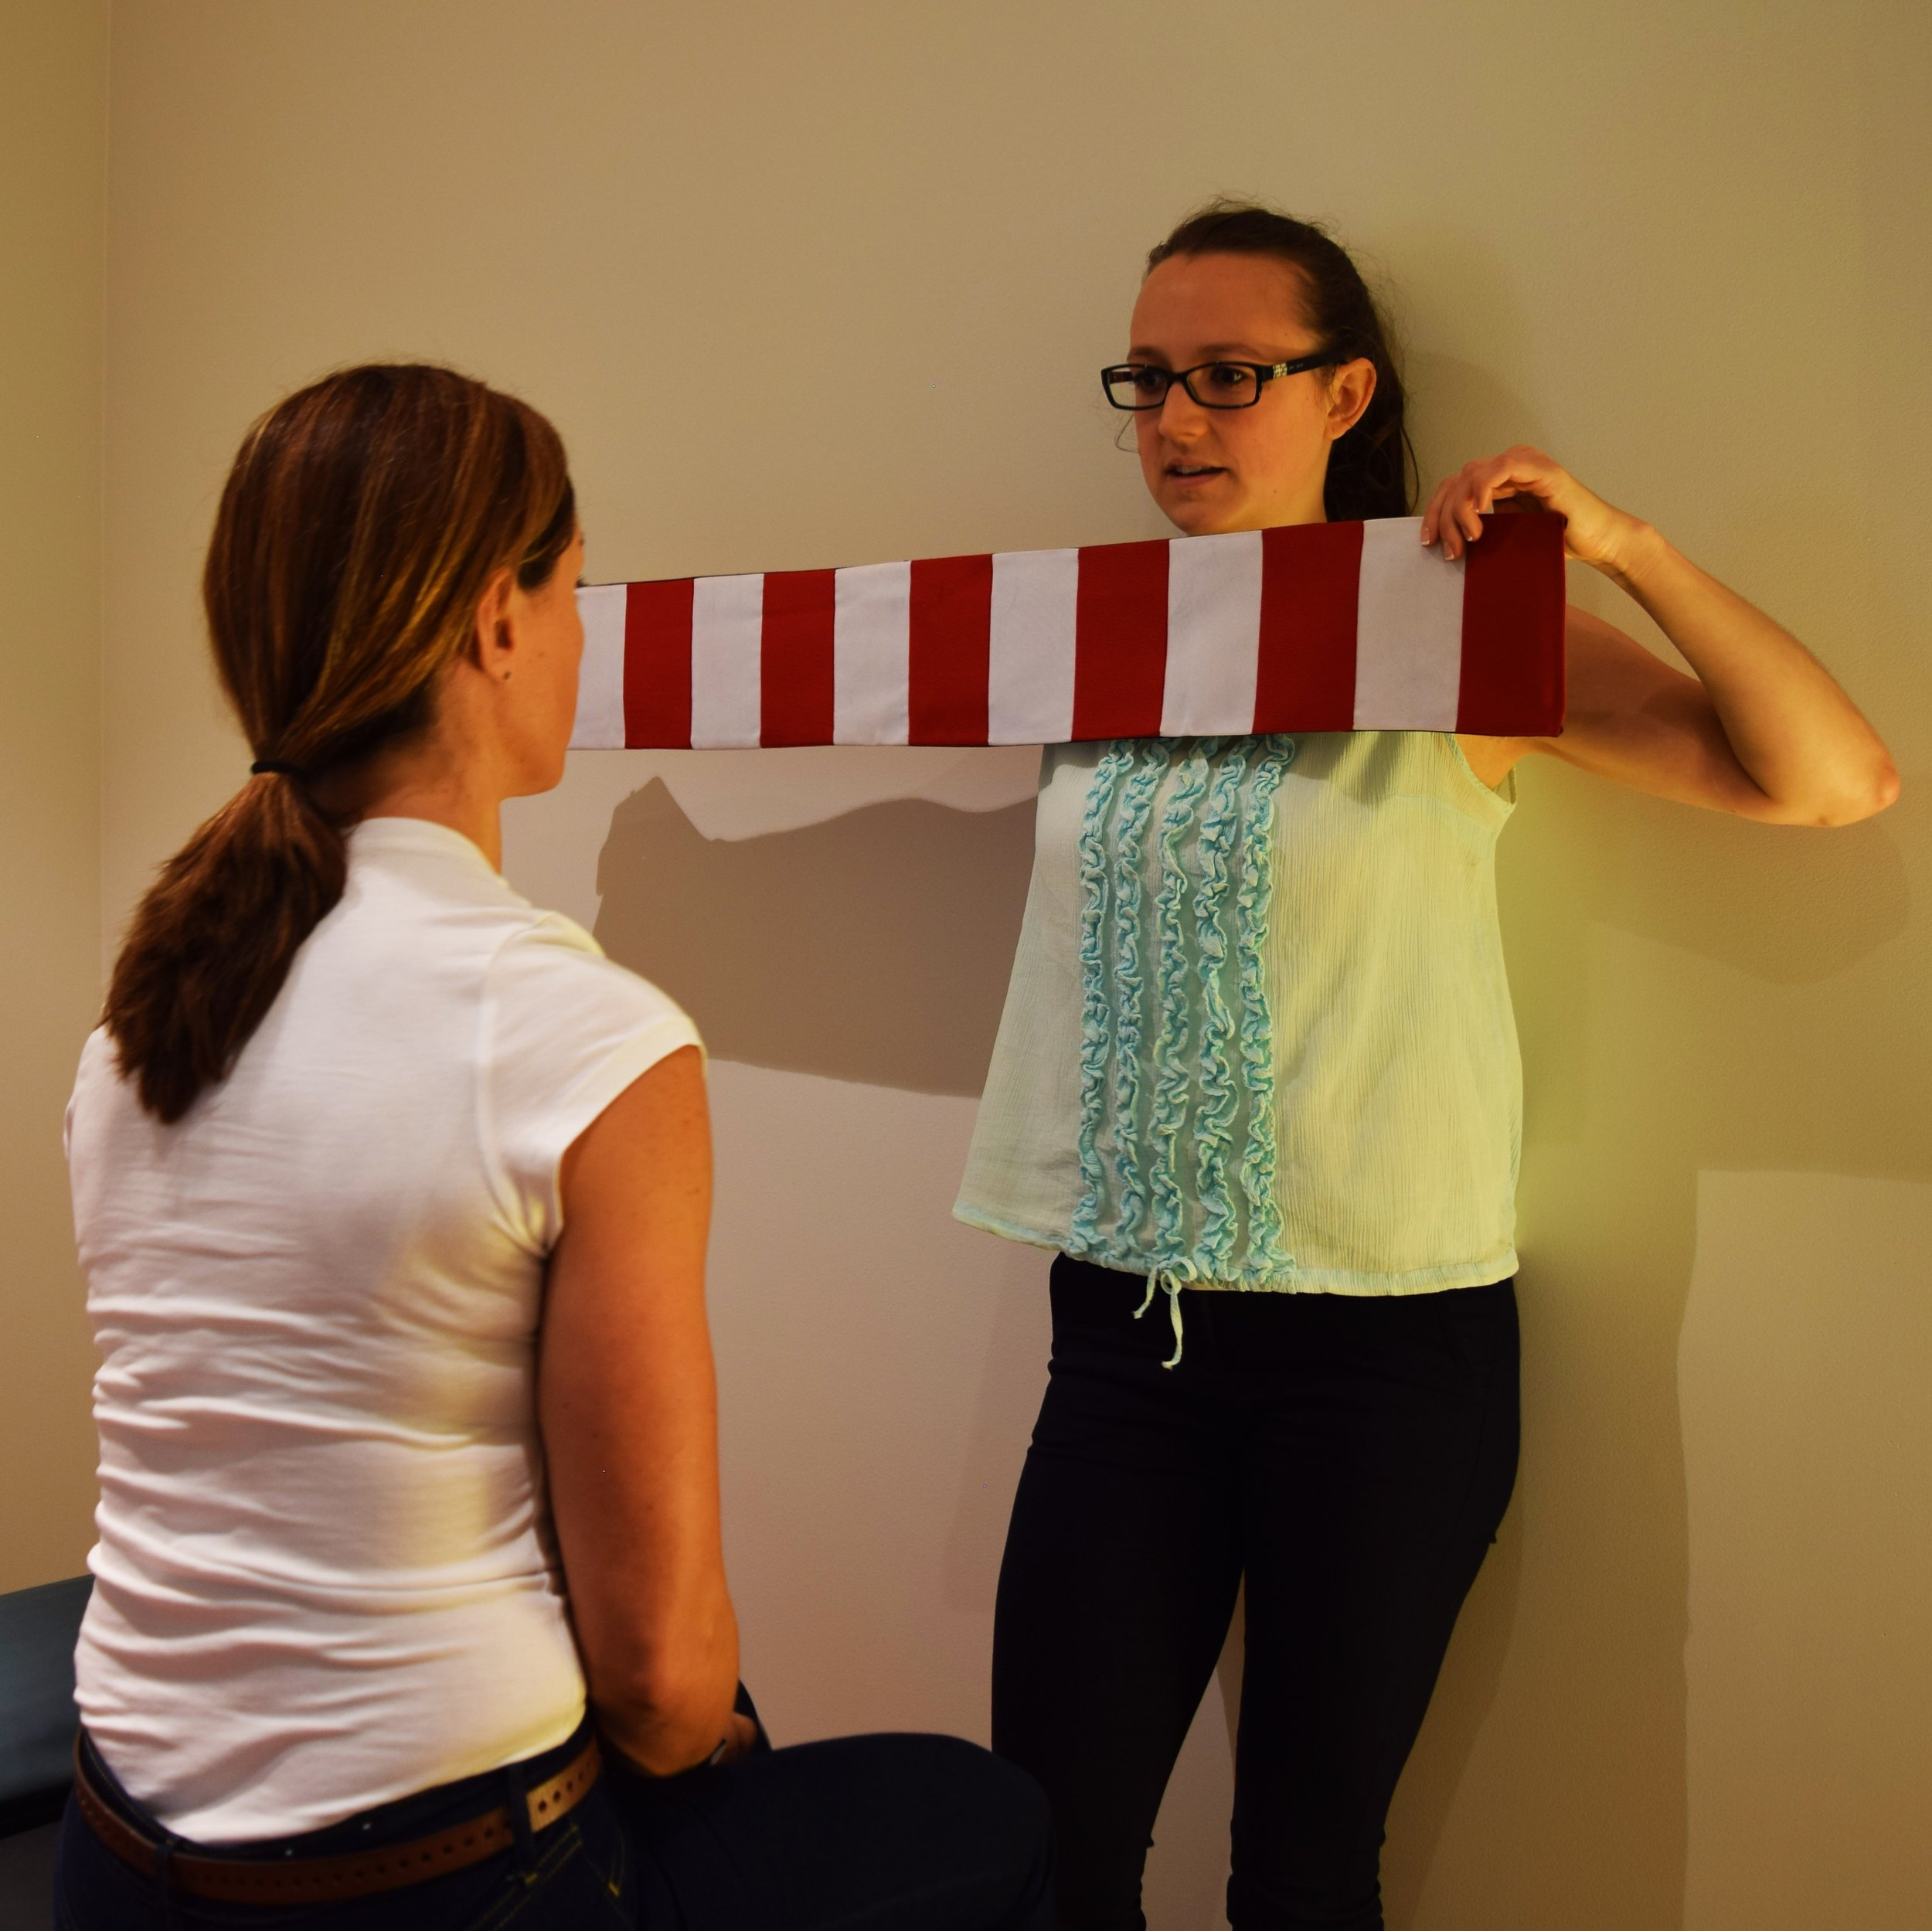 Testing eye movements & reflexes